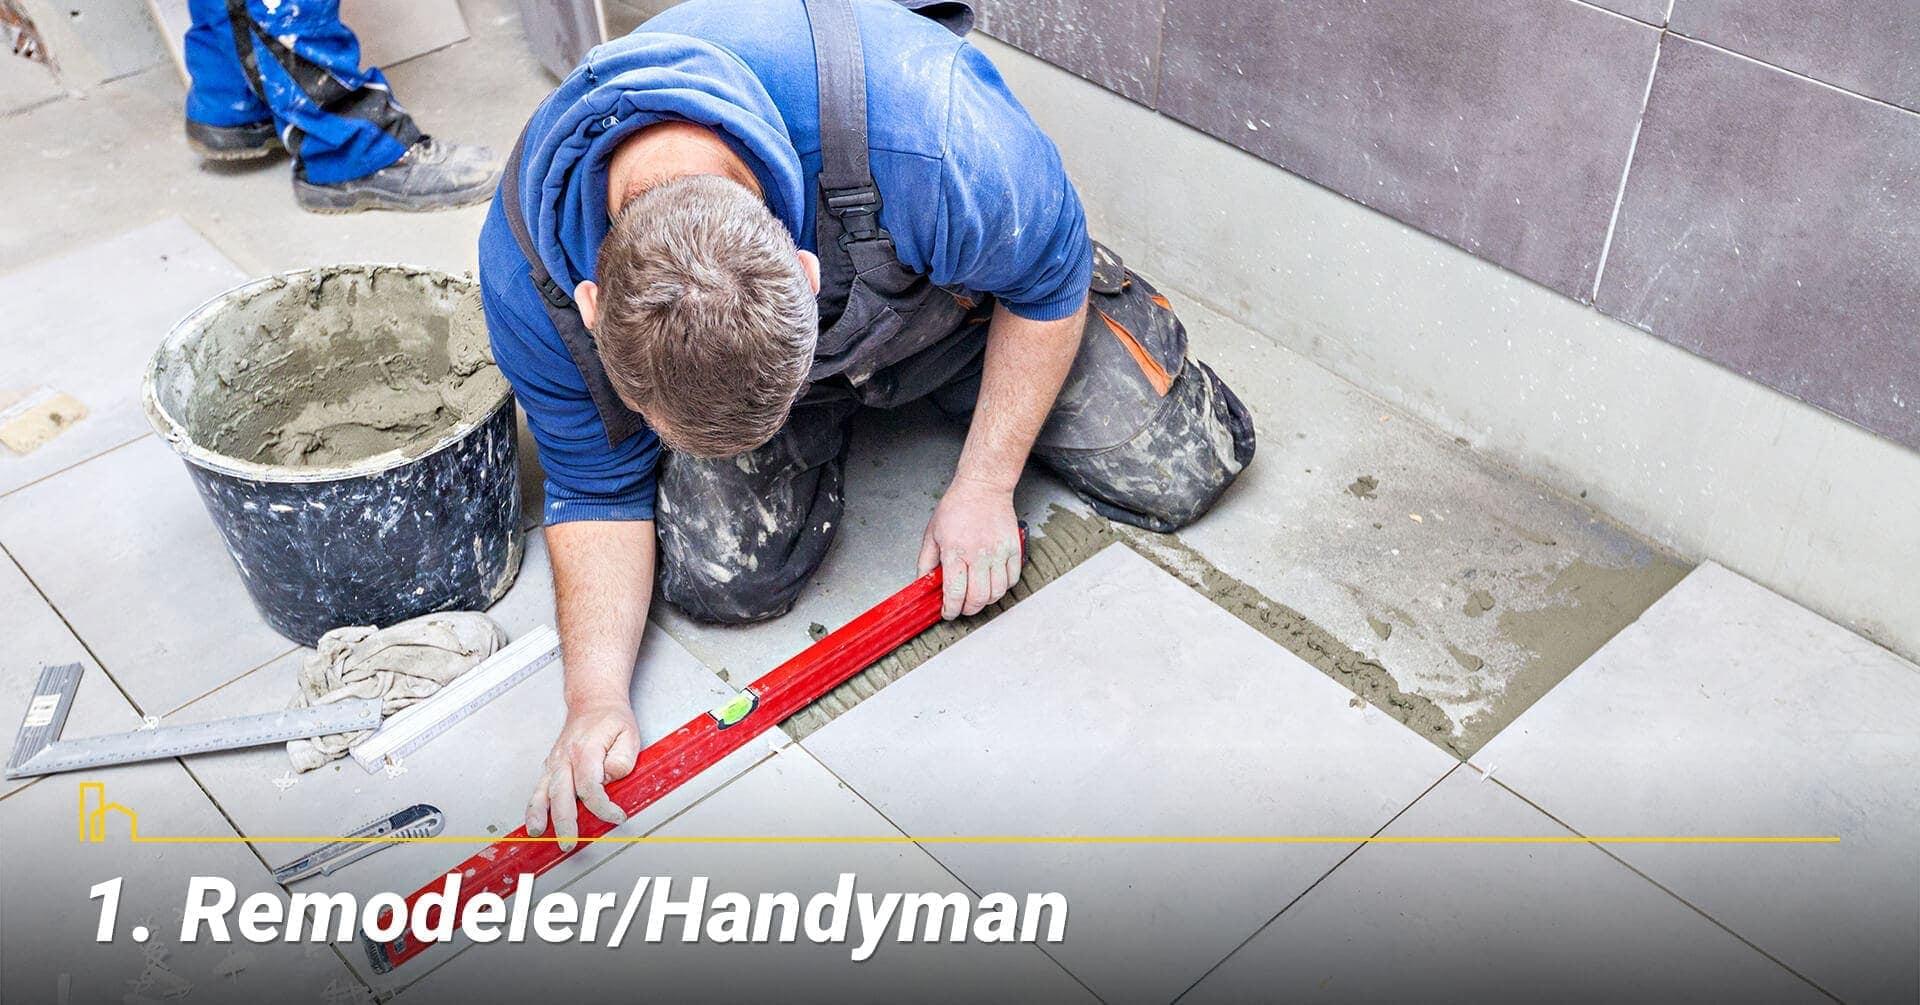 Remodeler/Handyman